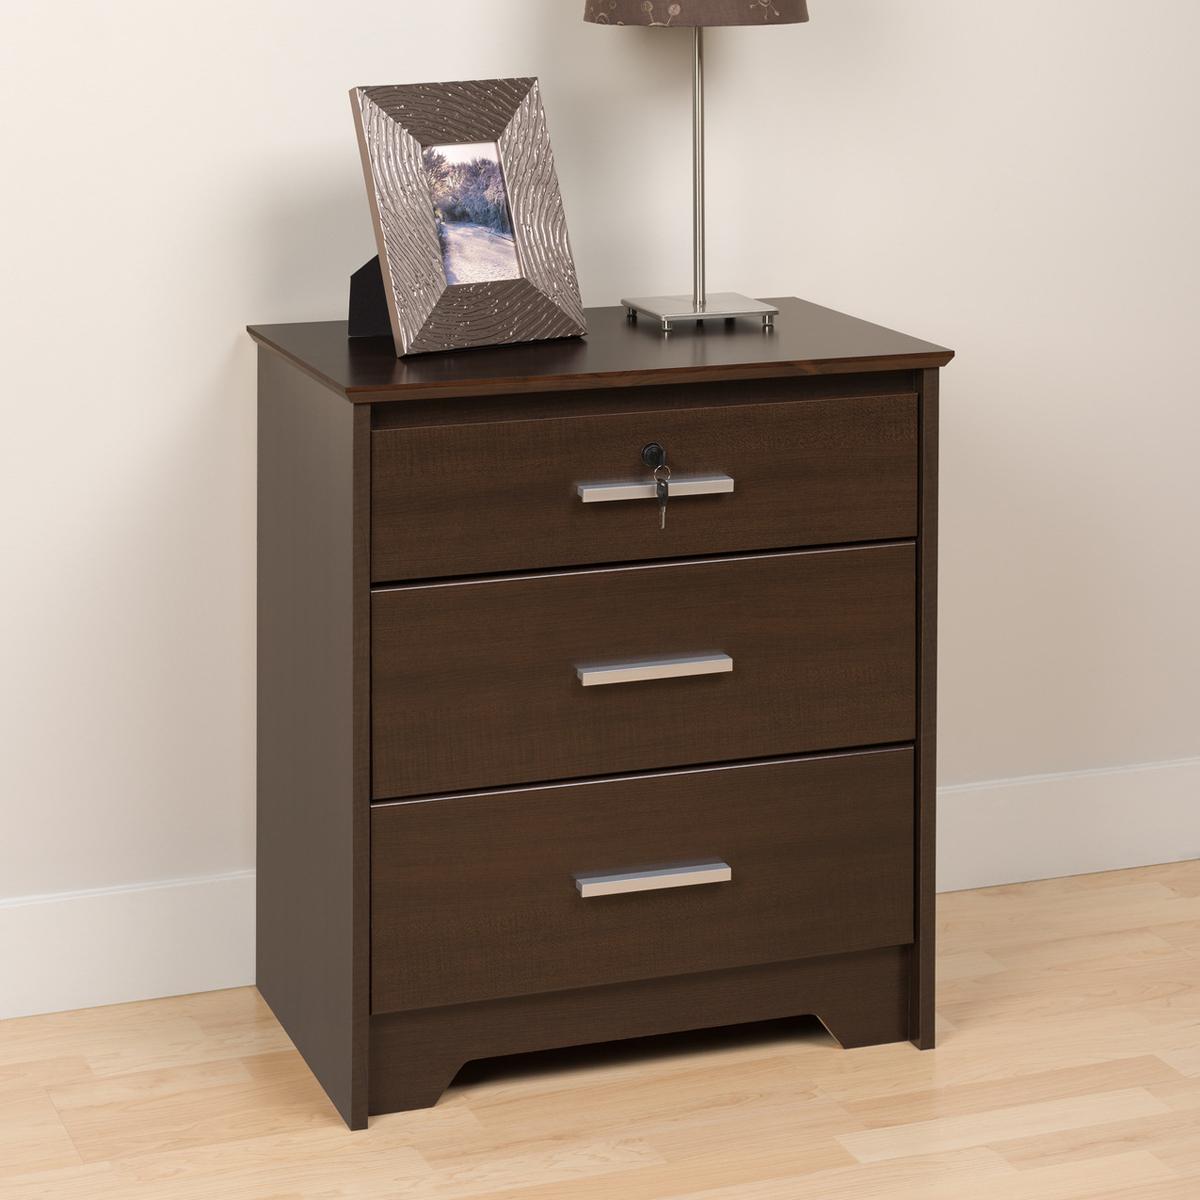 rosie 3 drawer nightstand. Black Bedroom Furniture Sets. Home Design Ideas